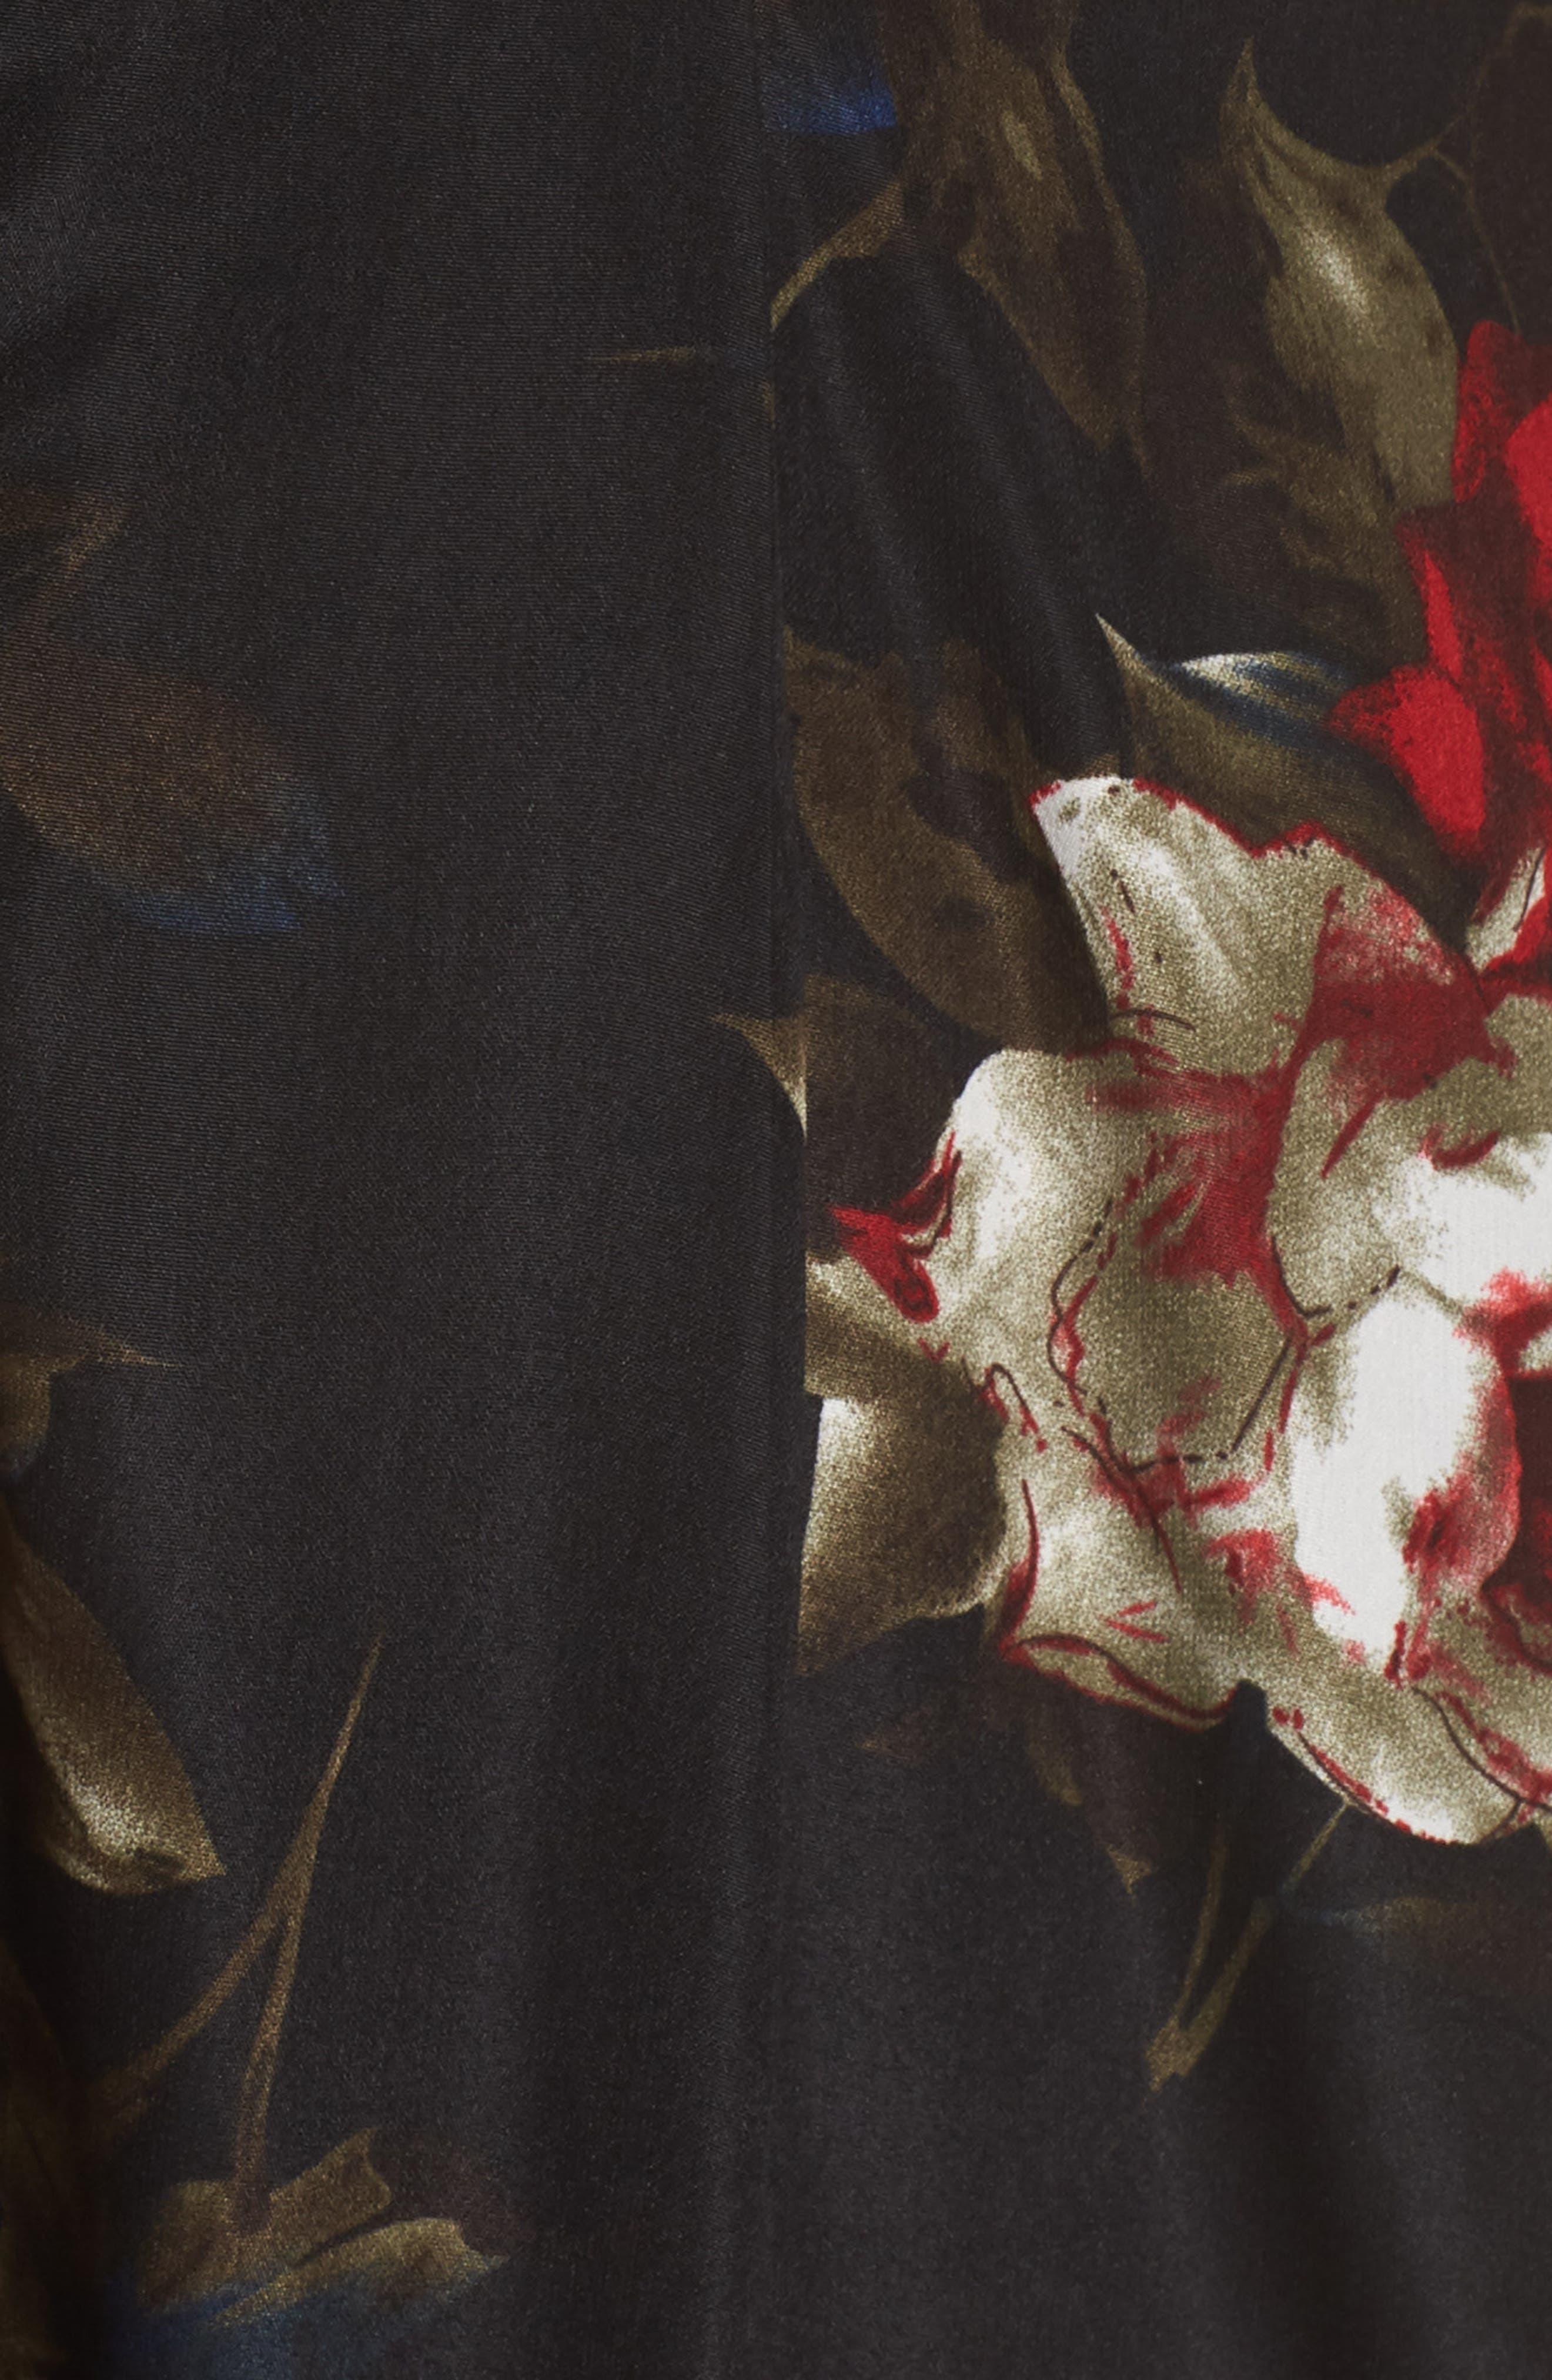 Off the Shoulder Midi Dress,                             Alternate thumbnail 12, color,                             BLACK LUSH ROSE FLORAL